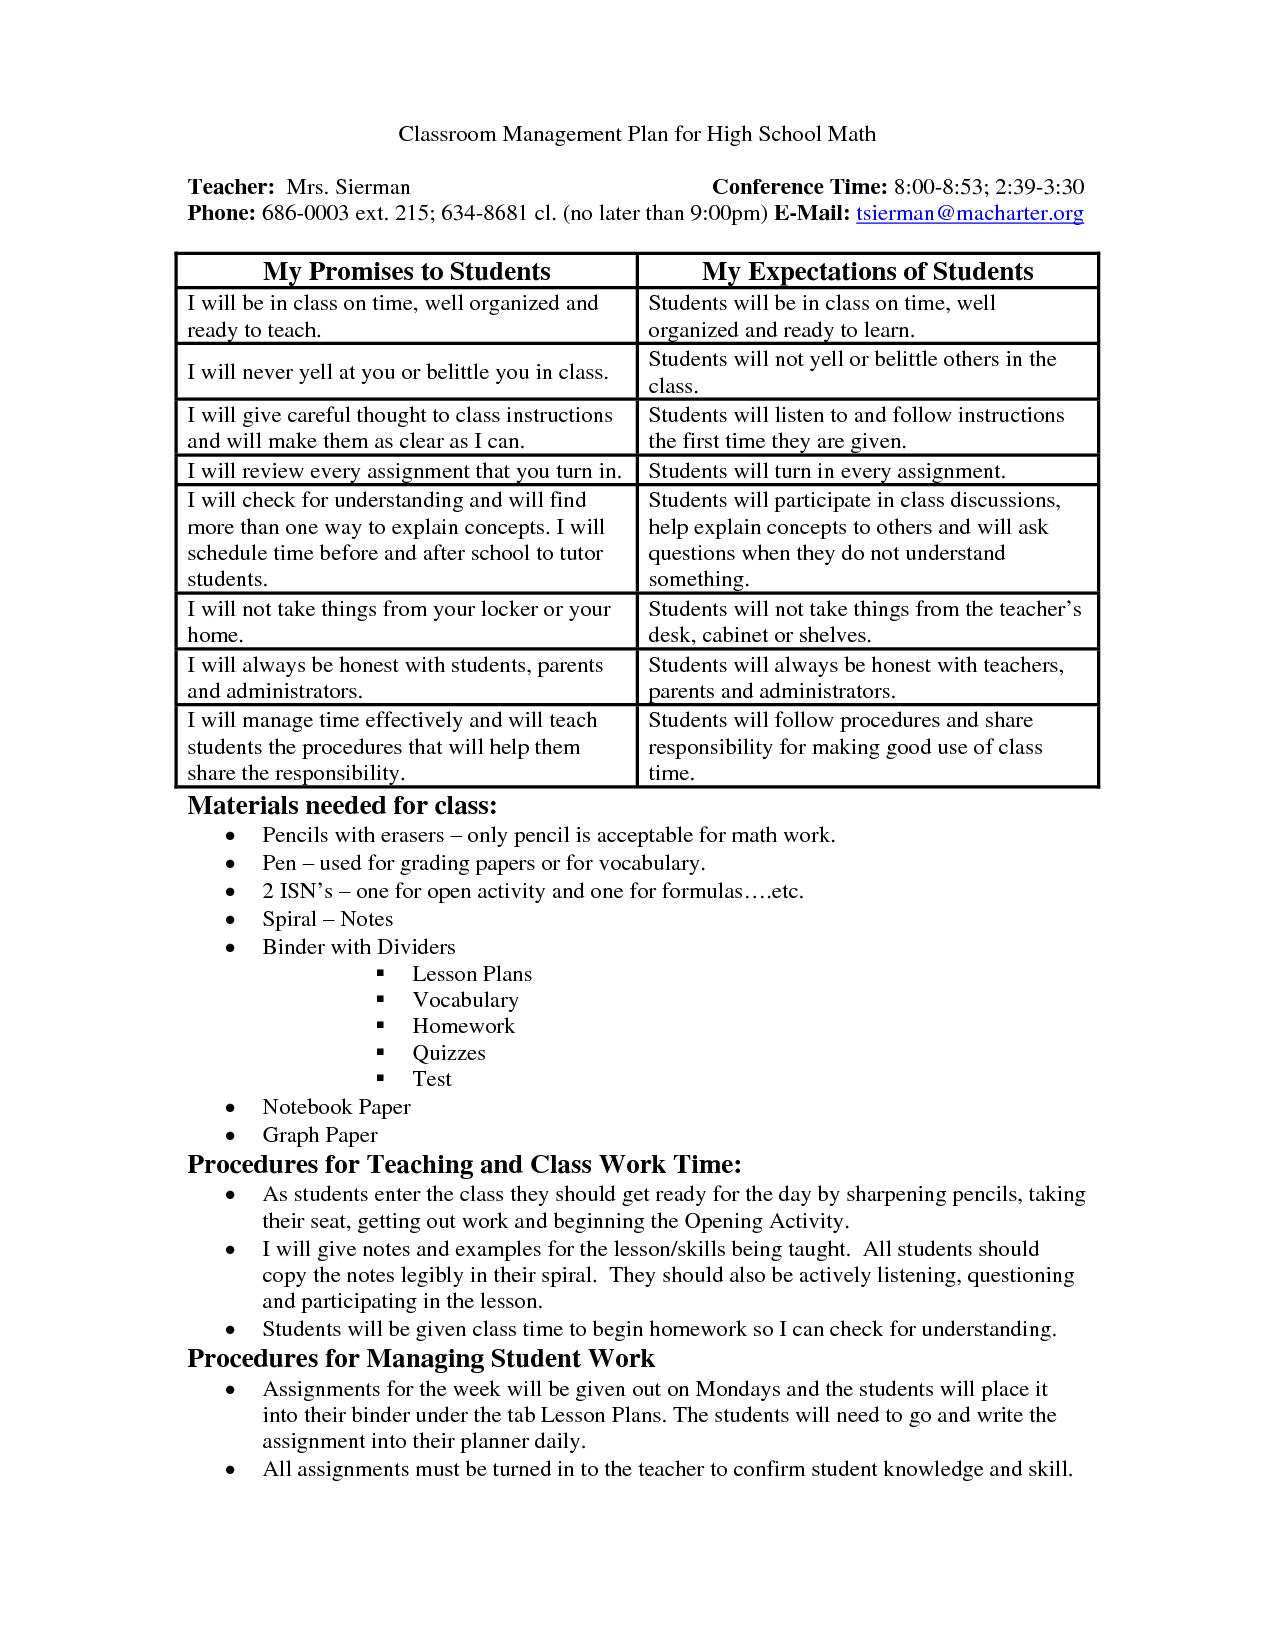 school management application in c